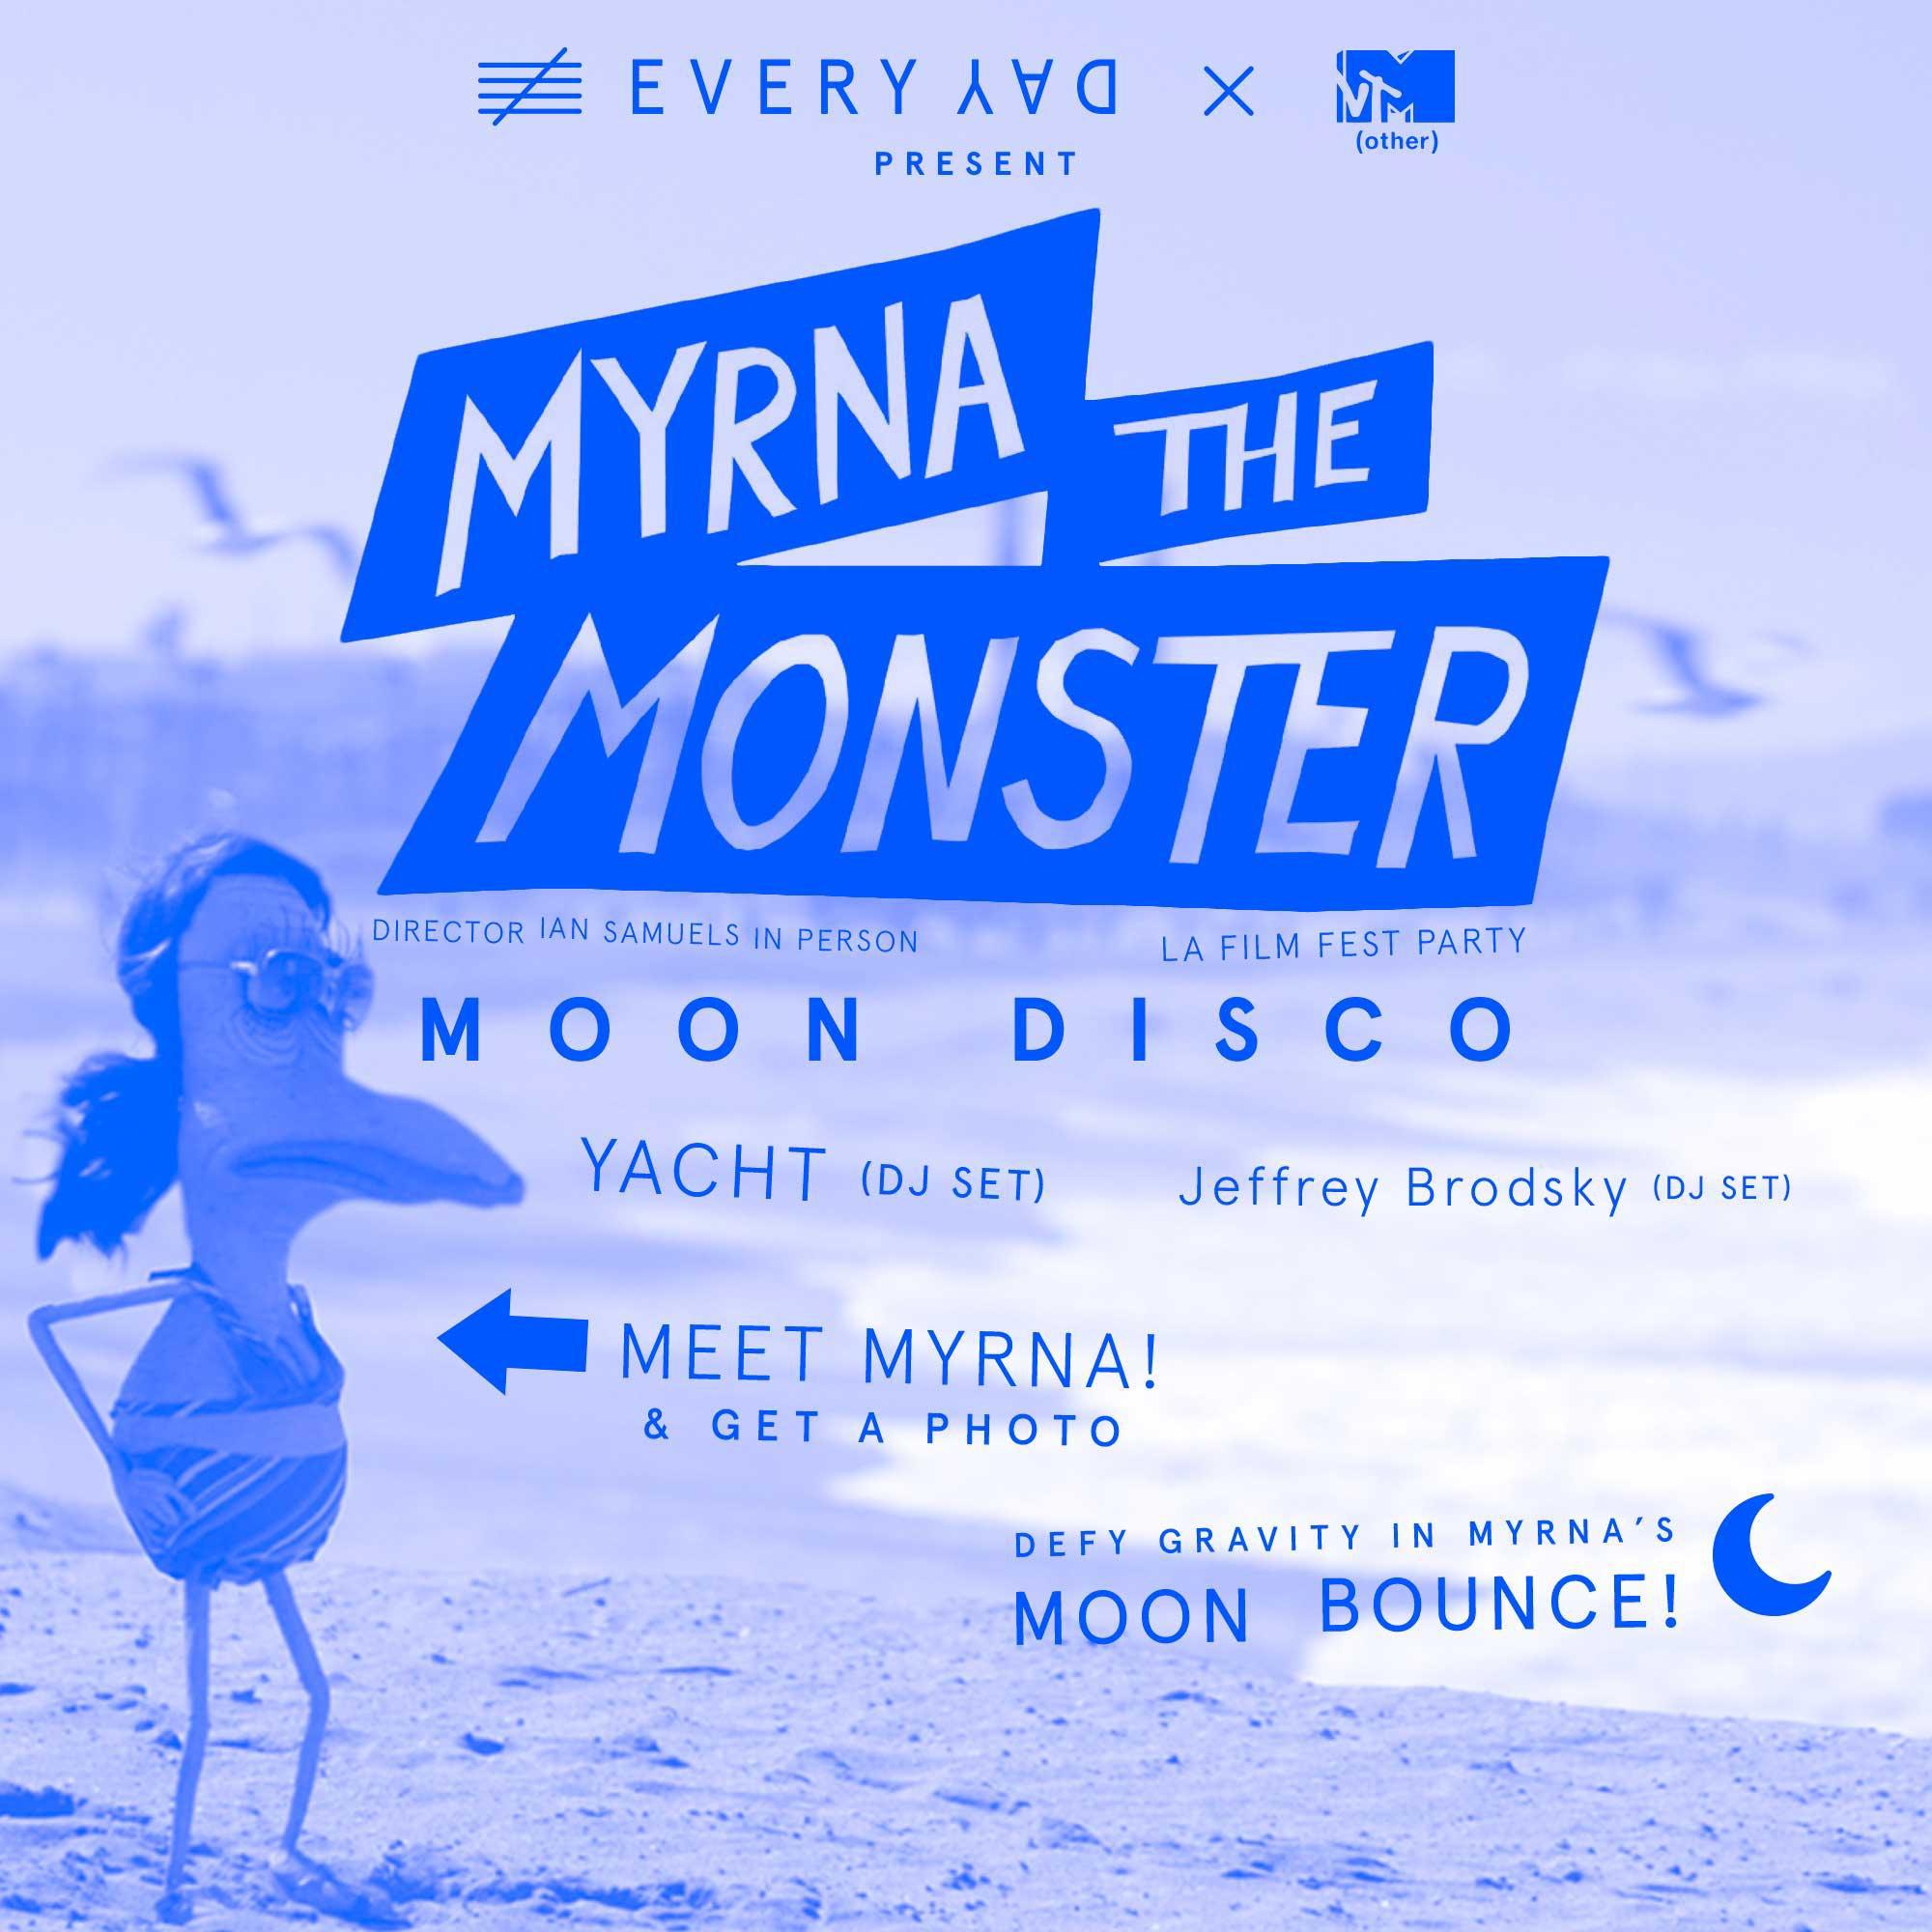 Party for Myrna the Monster short film. Original score by Jeffrey Brodsky, Jona Bechtolt, and Robert Kieswetter.